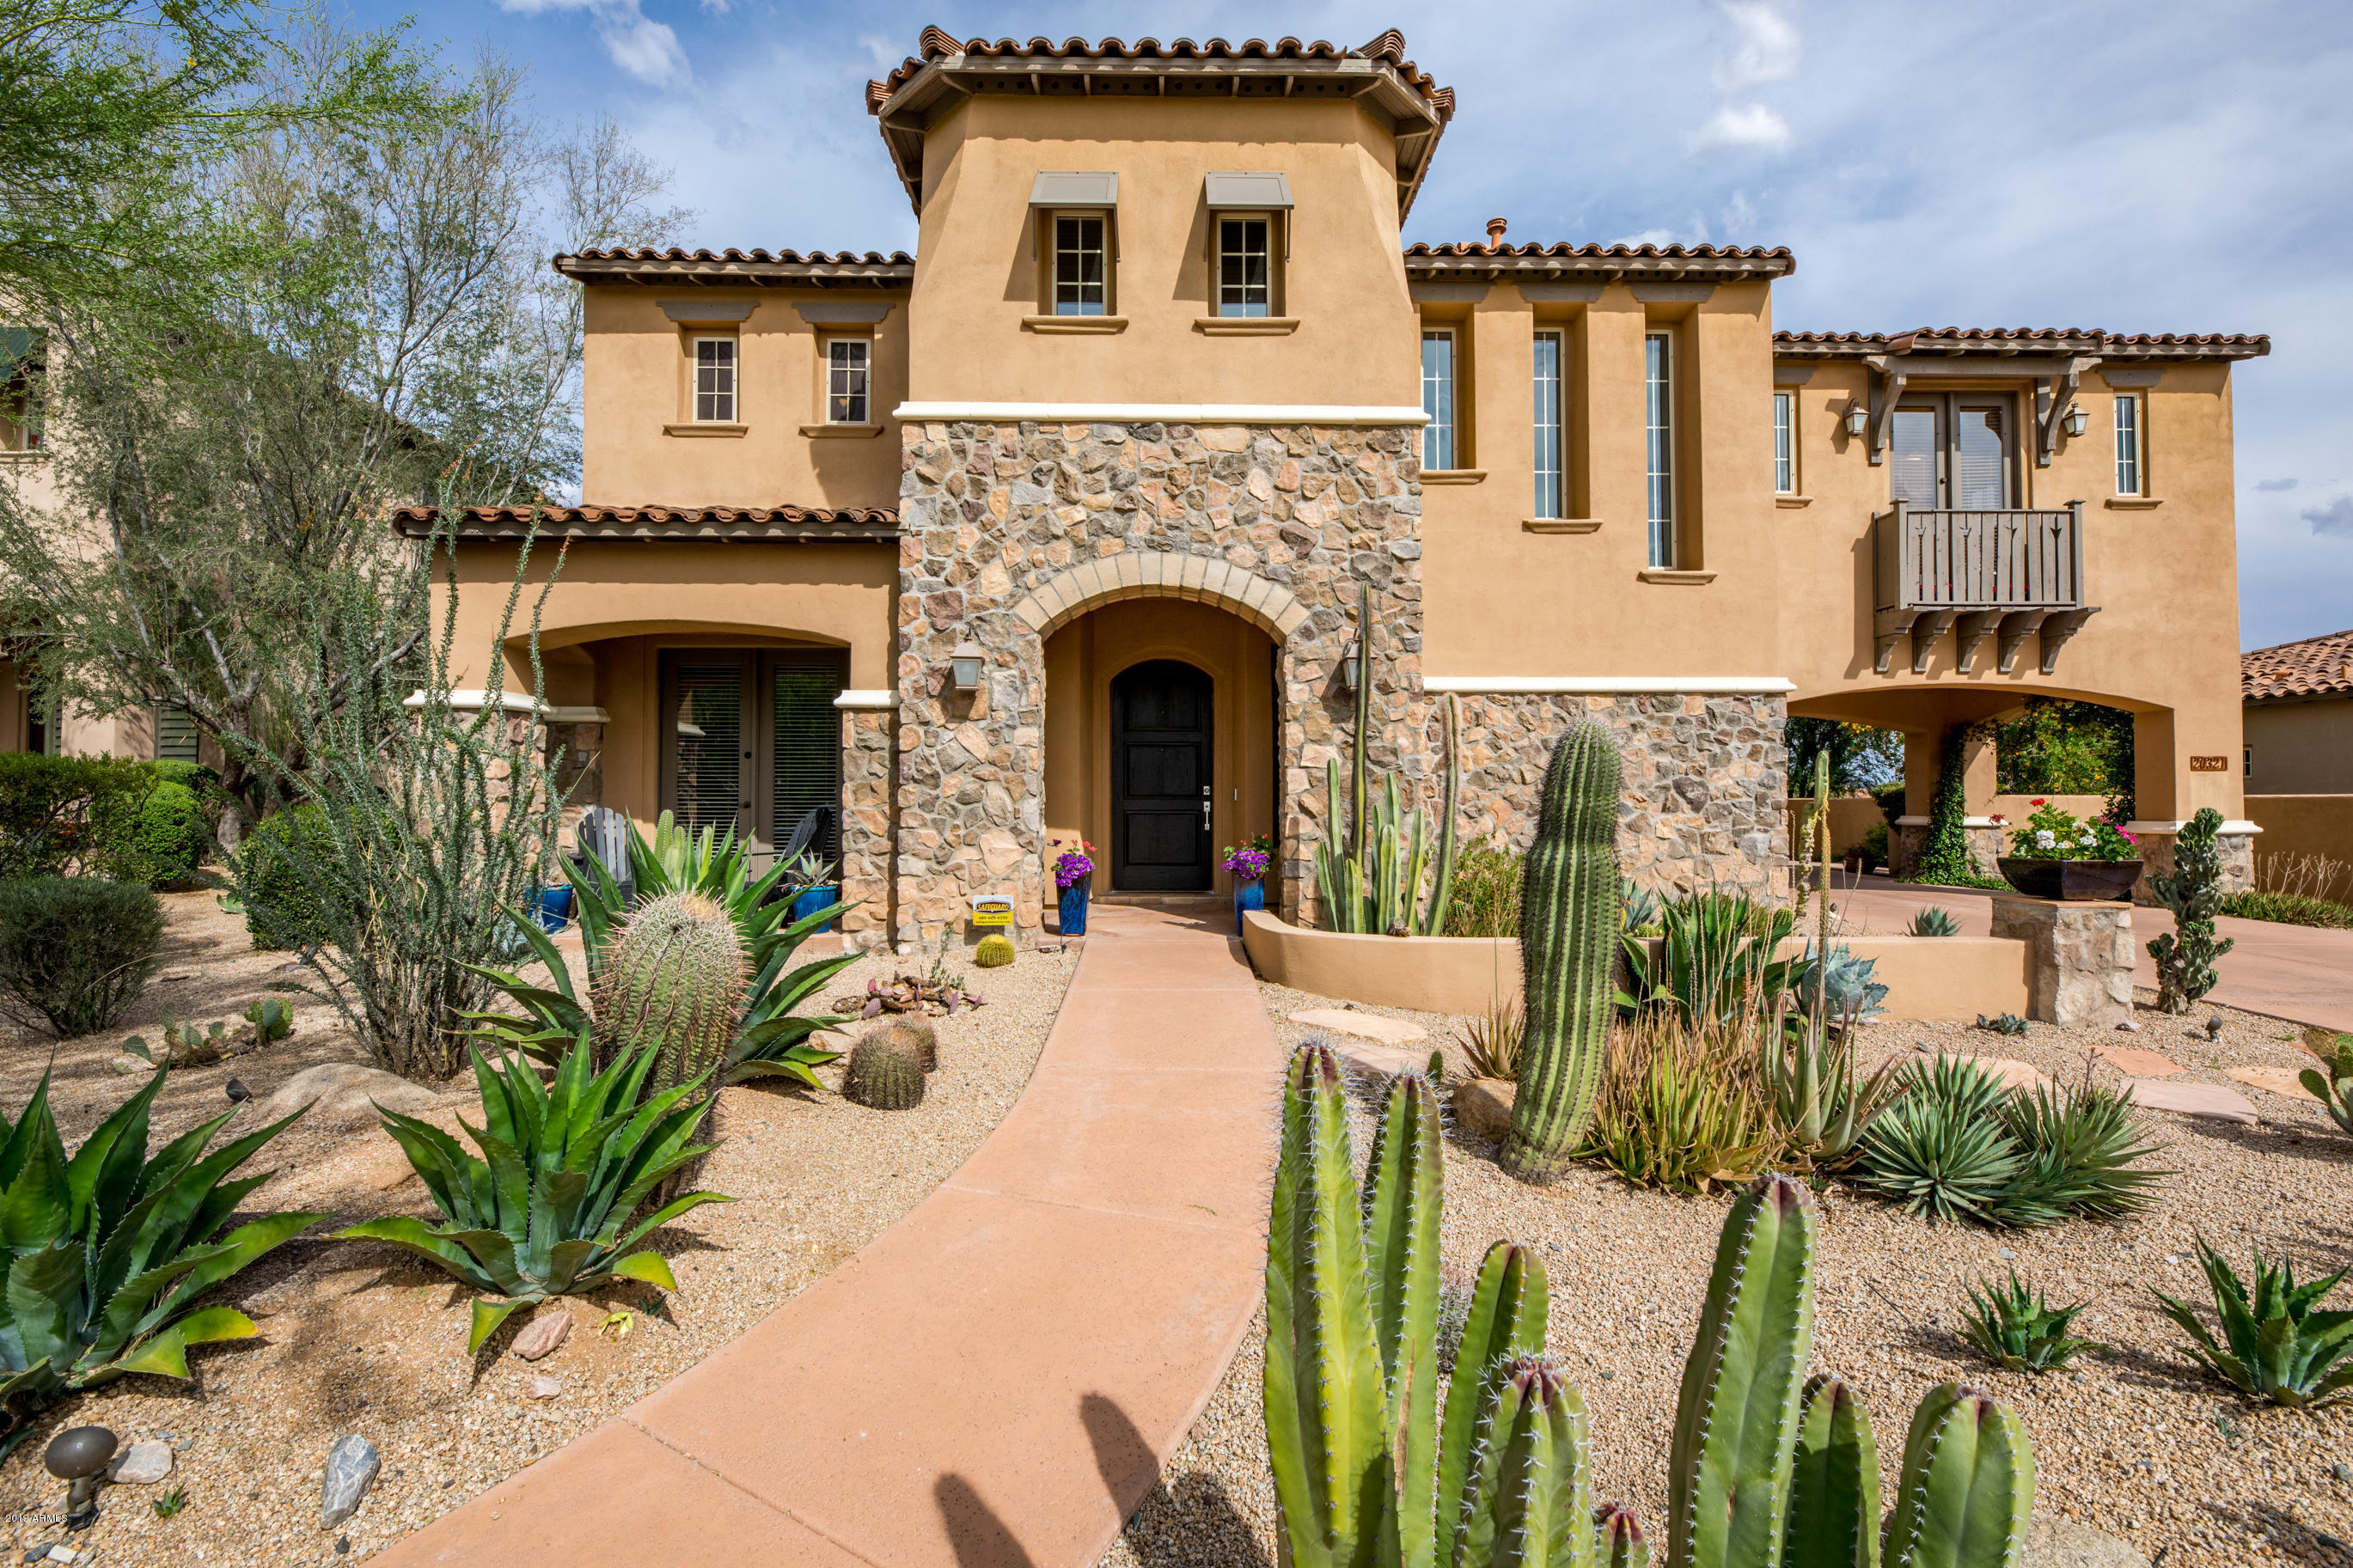 MLS 5925871 20321 N 93RD Place, Scottsdale, AZ 85255 Scottsdale AZ Private Pool